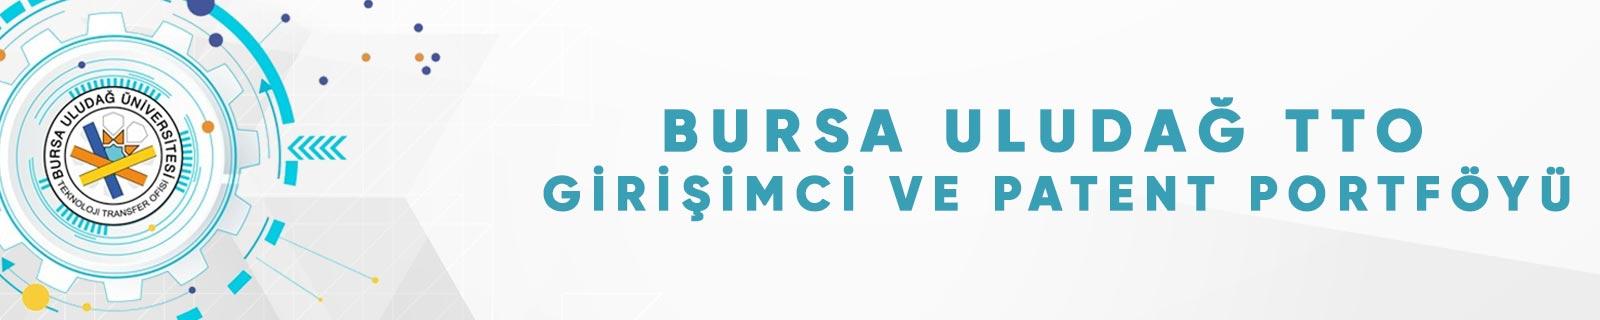 Bursa Uludağ TTO Girişimci ve Patent Portföyü